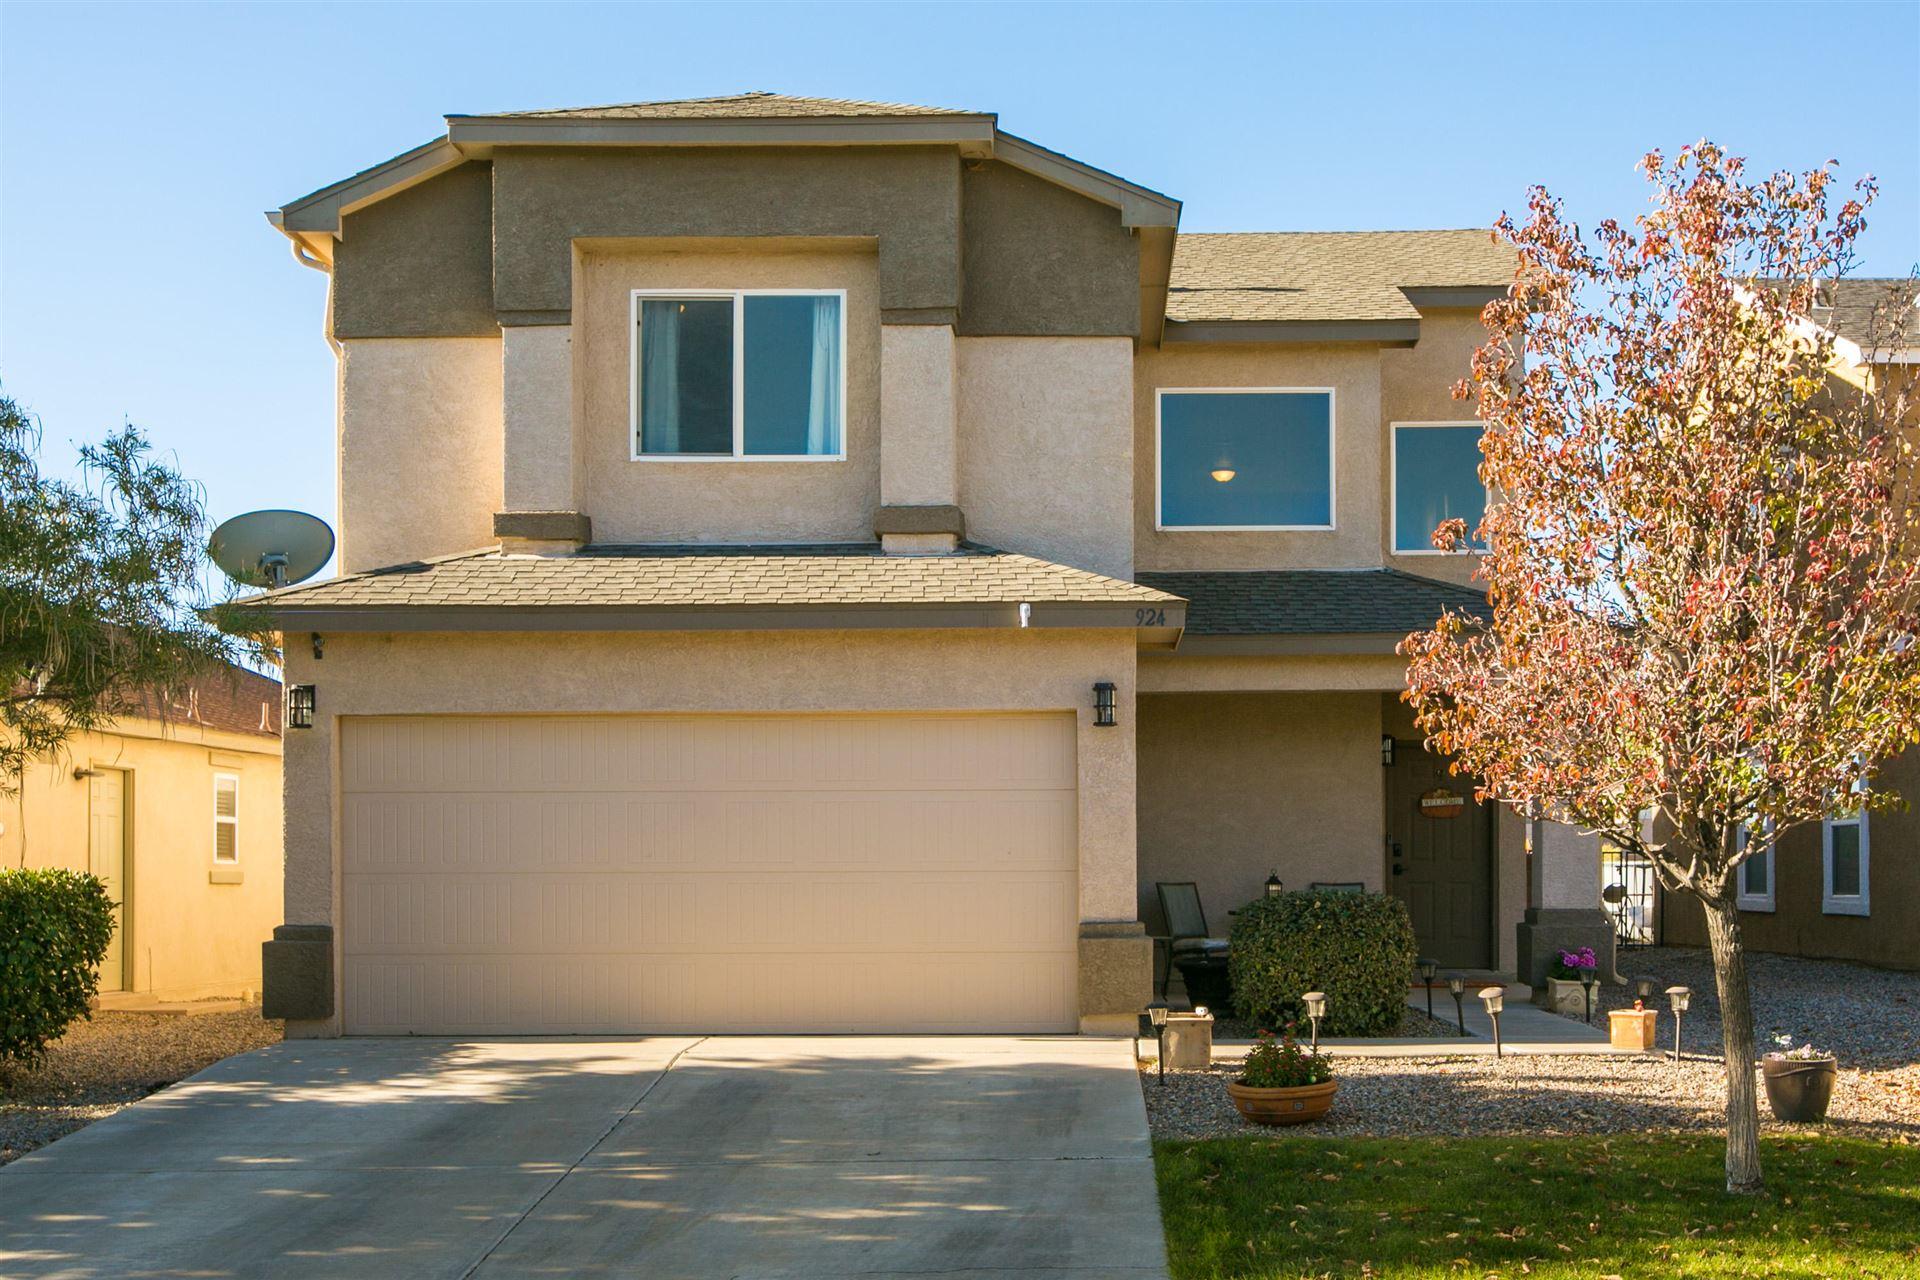 924 WATERFALL Drive NE, Rio Rancho, NM 87144 - #: 979395